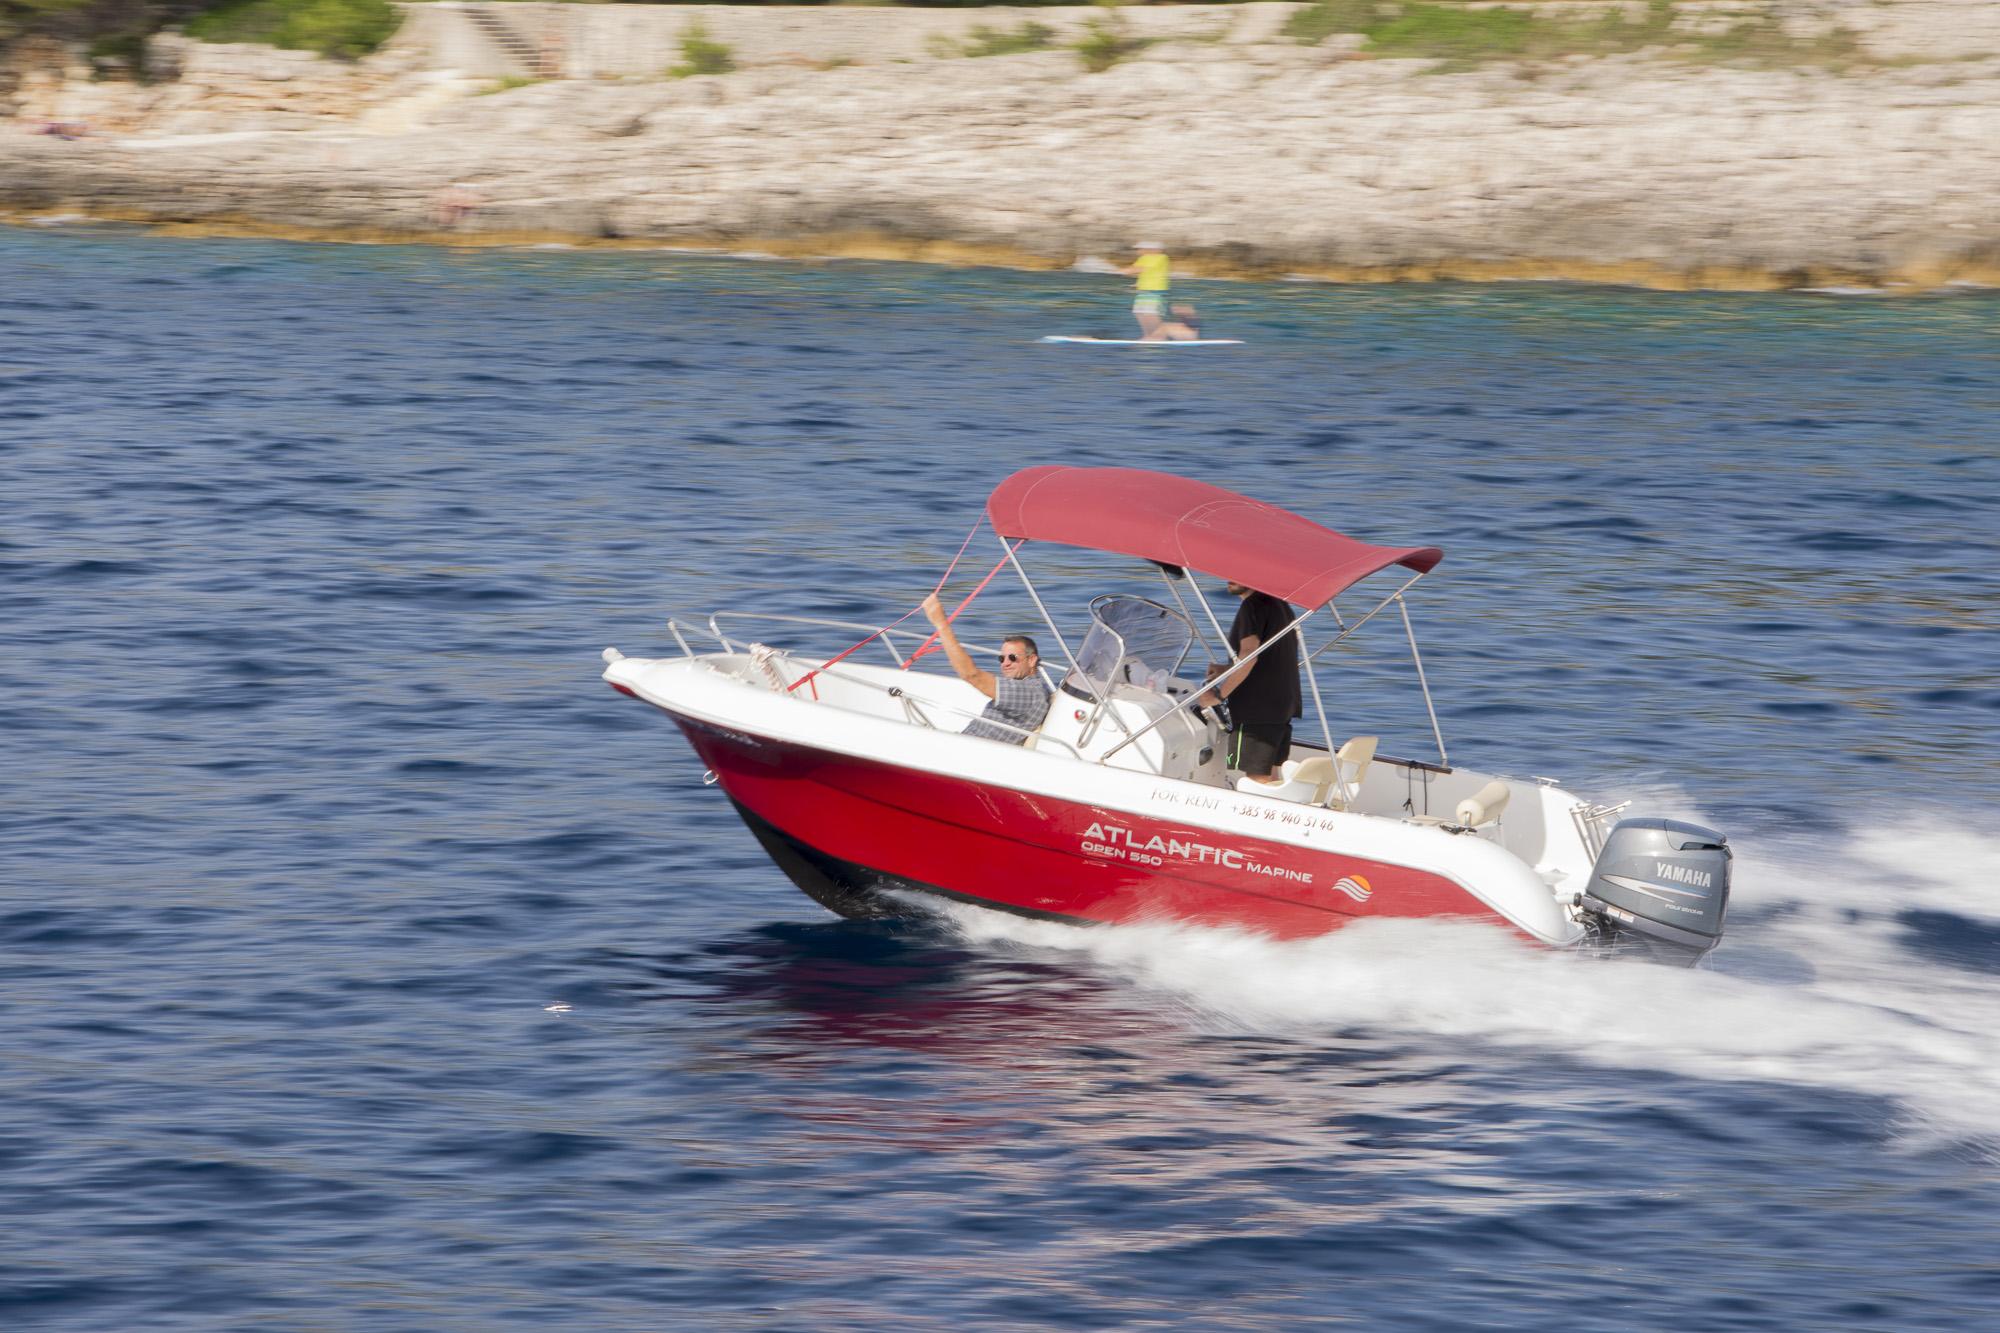 Igor Kastelic: Panning čolna